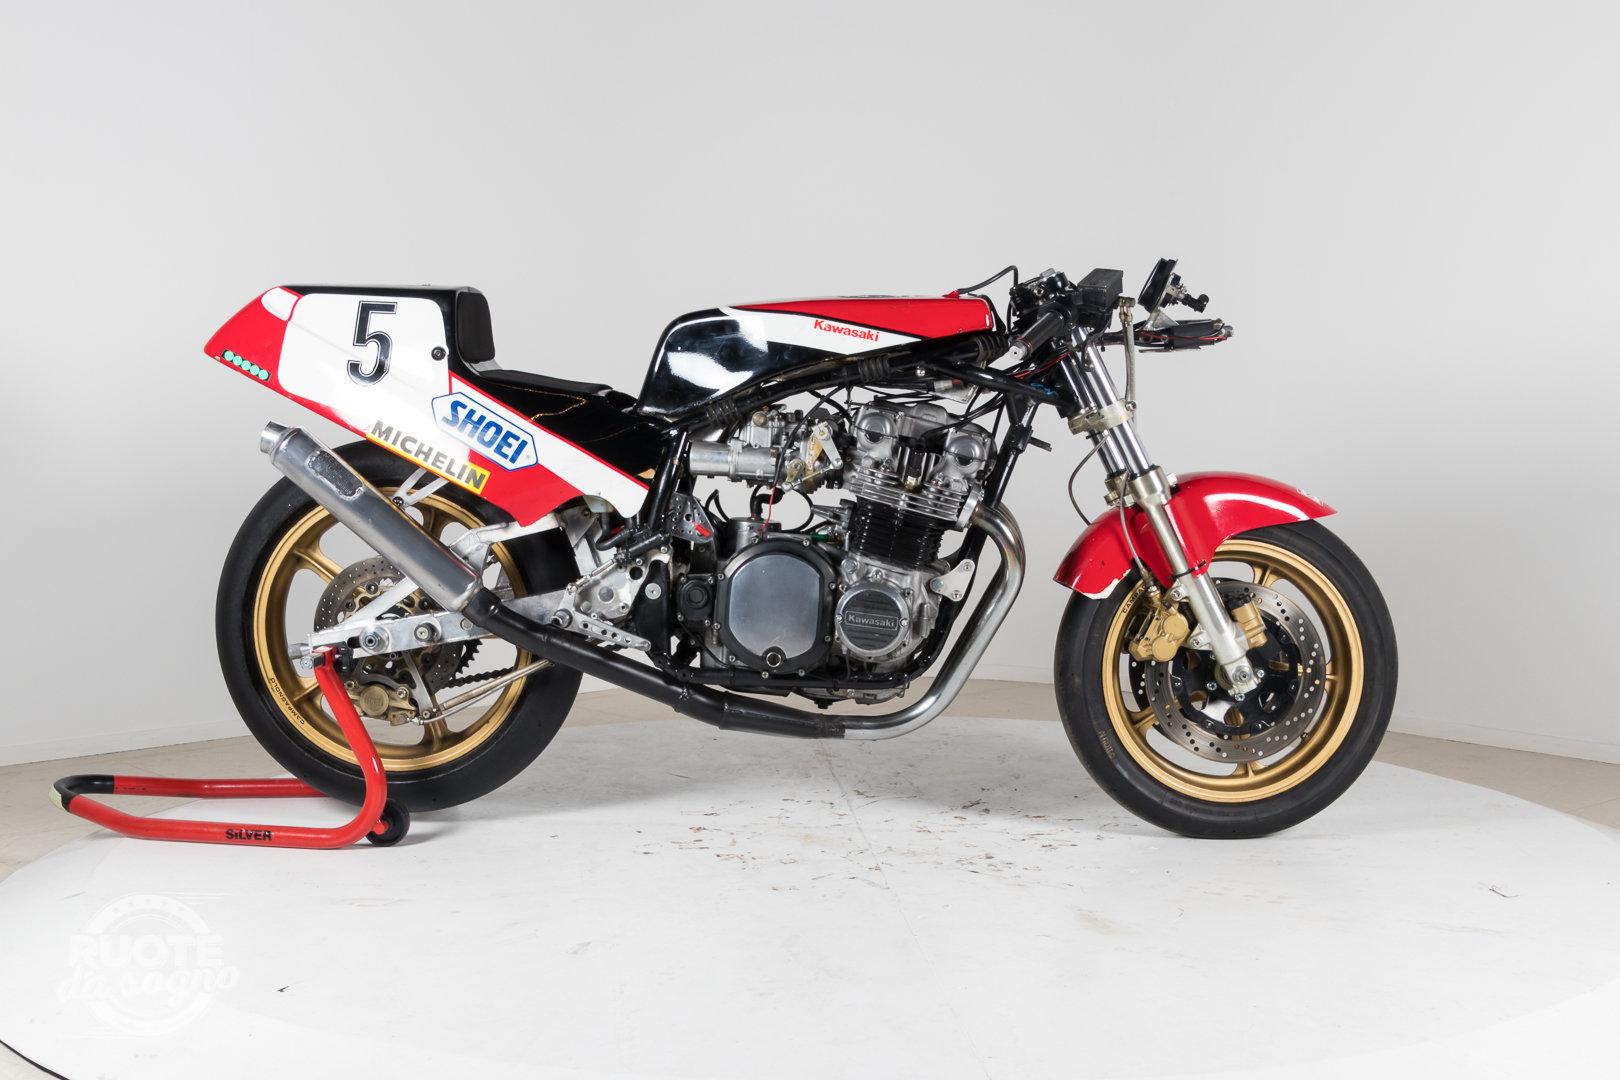 SUZUKI - XR-69 HARRIS F1 - 1984 For Sale (picture 2 of 6)